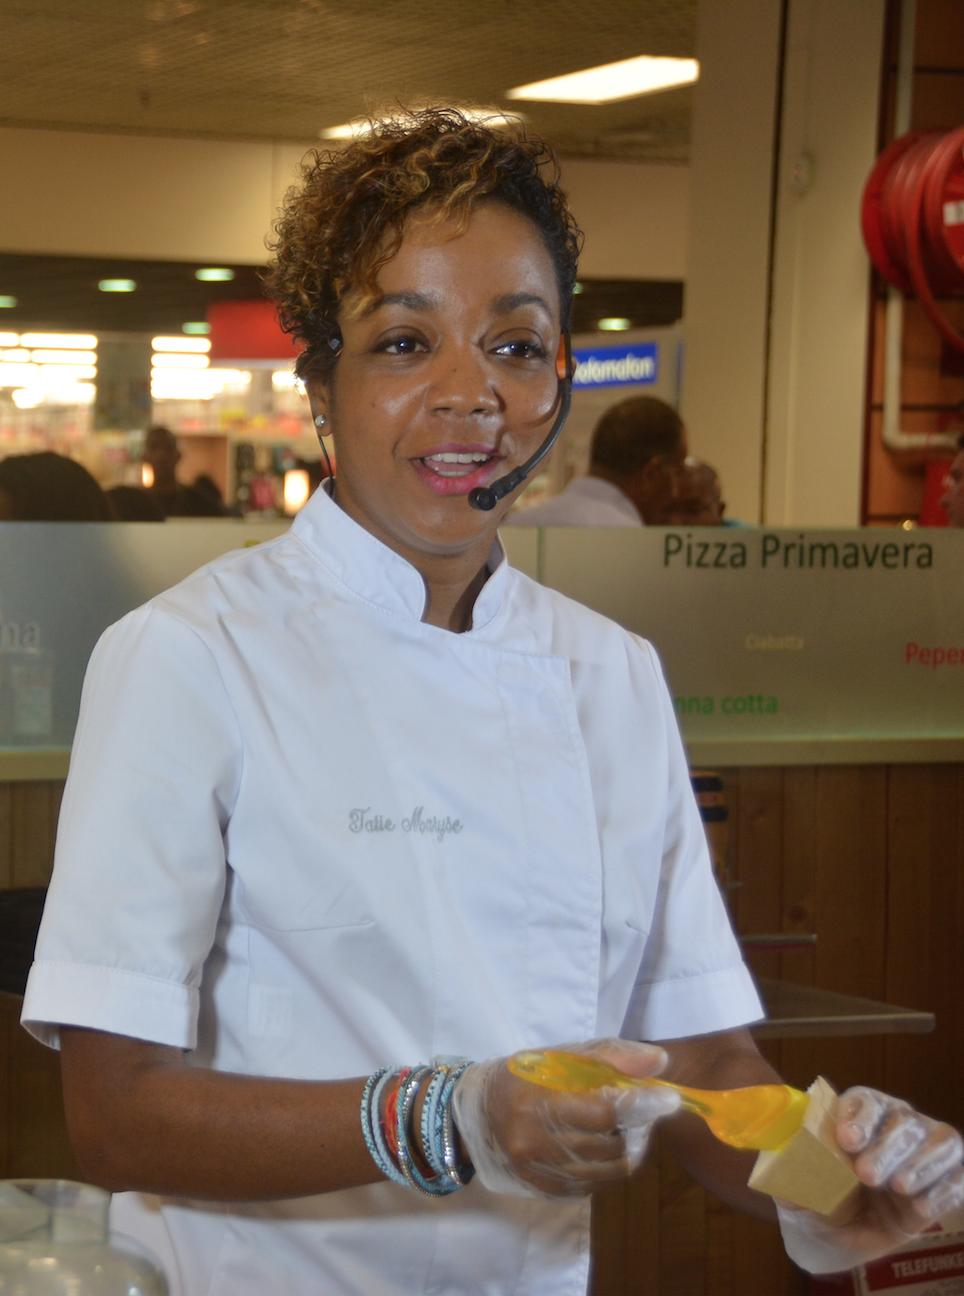 Le blog de cuisine antillaise de tatie maryse - Livre de cuisine antillaise ...